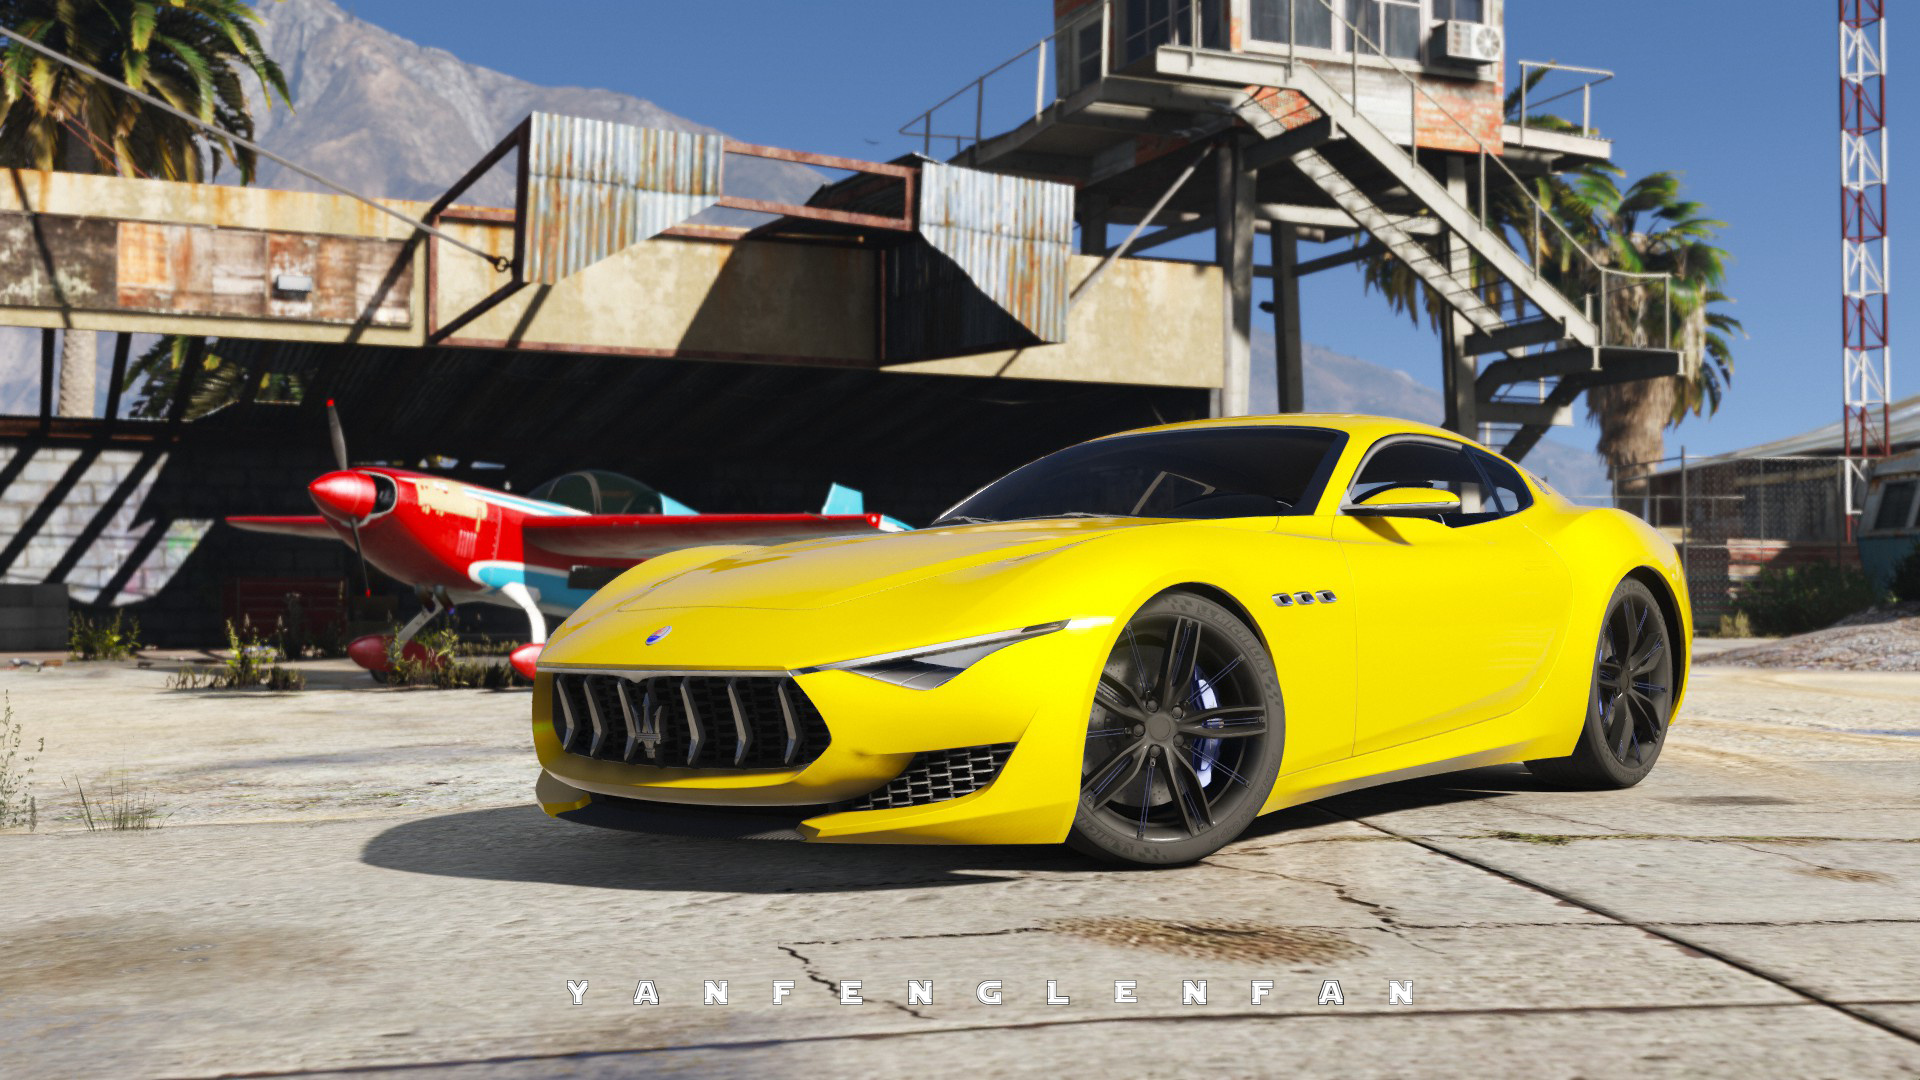 Maserati Alfieri 2014 Concept Car [ Add-On | Digital gear | HQ ...